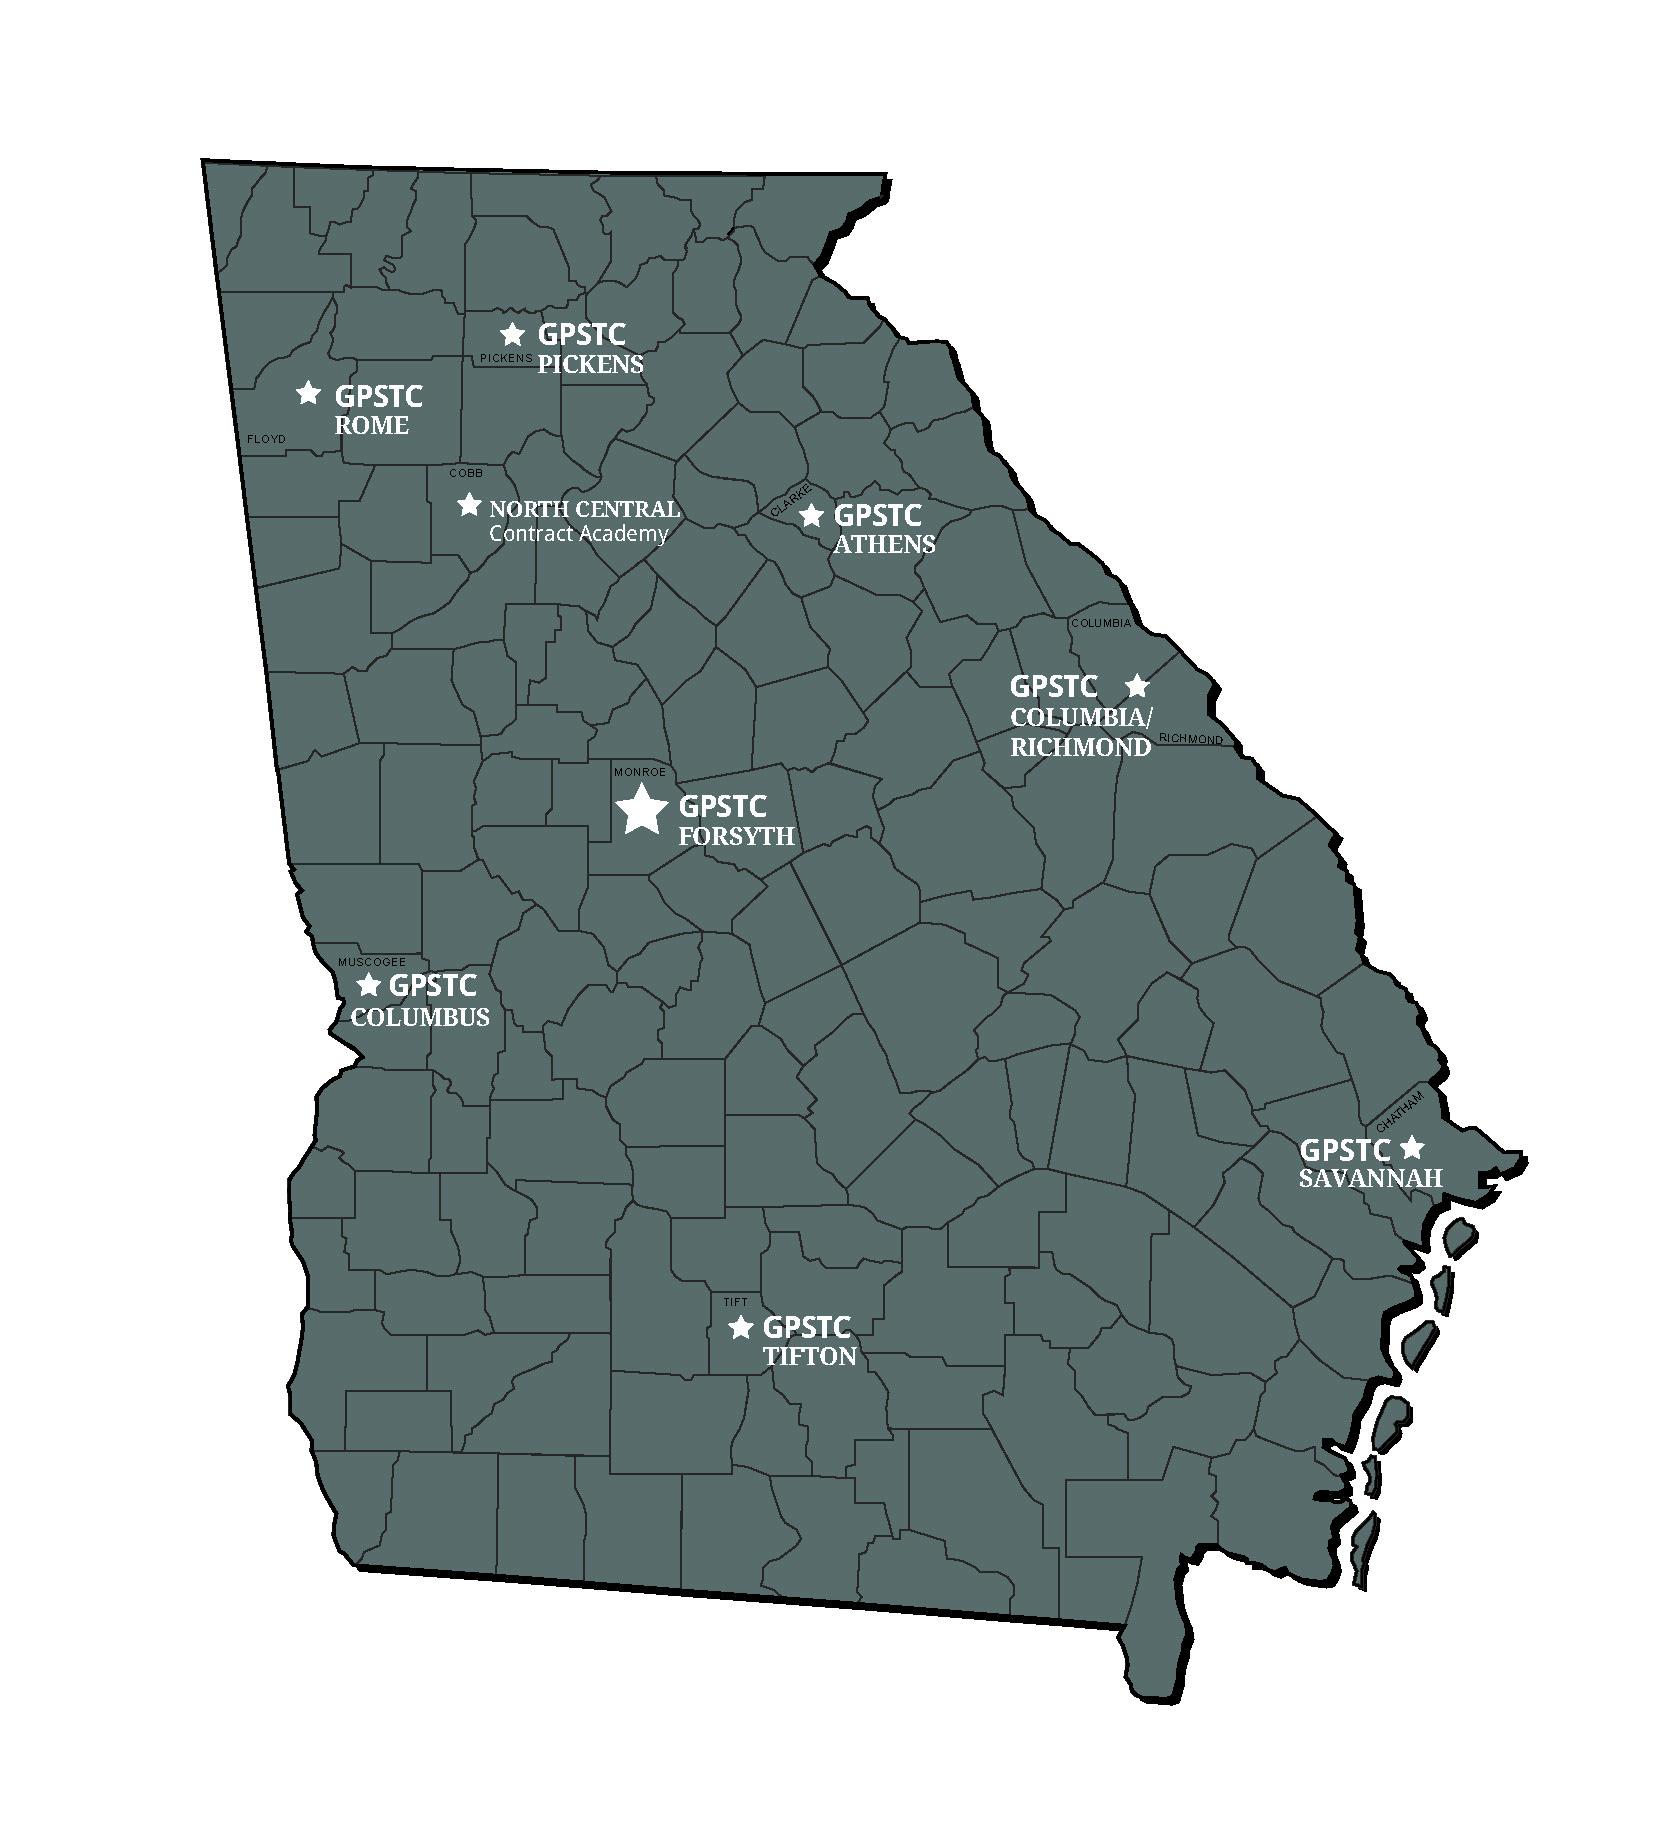 Forsyth Georgia Map.Gpstc Regional Academies Gpstc